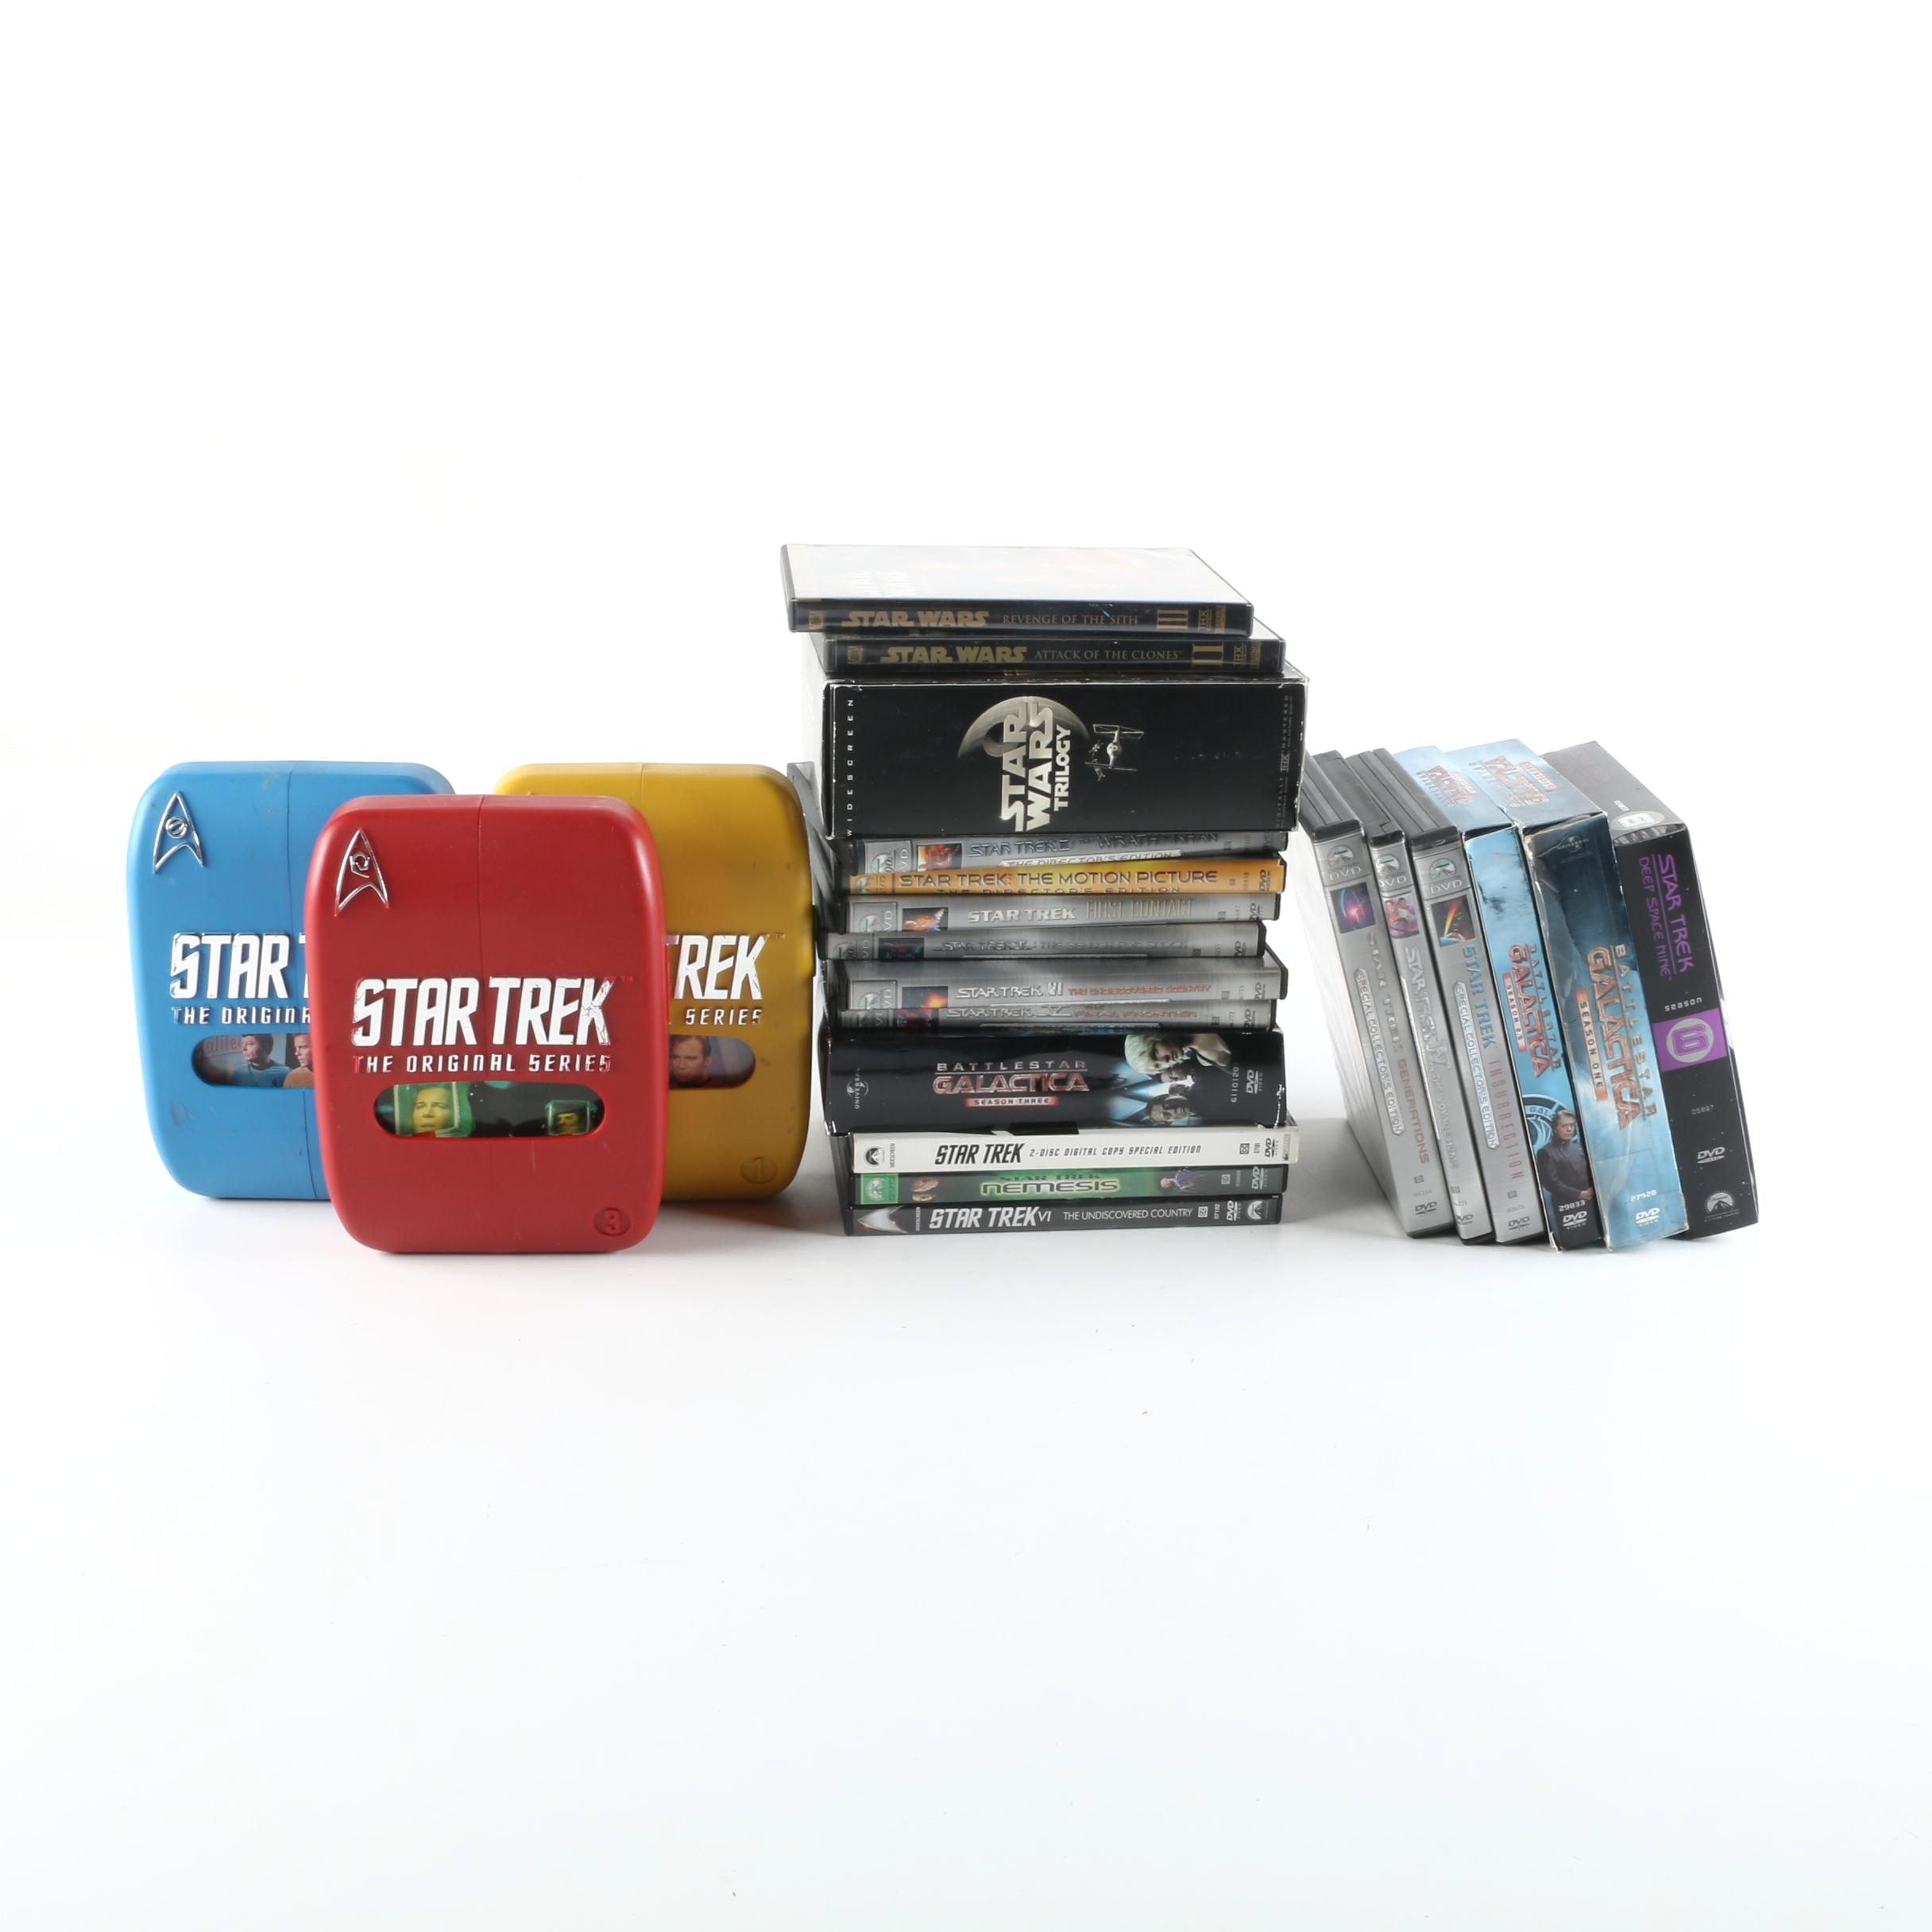 """Star Trek"", ""Battlestar Galactica"", and ""Star Wars"" DVDs"